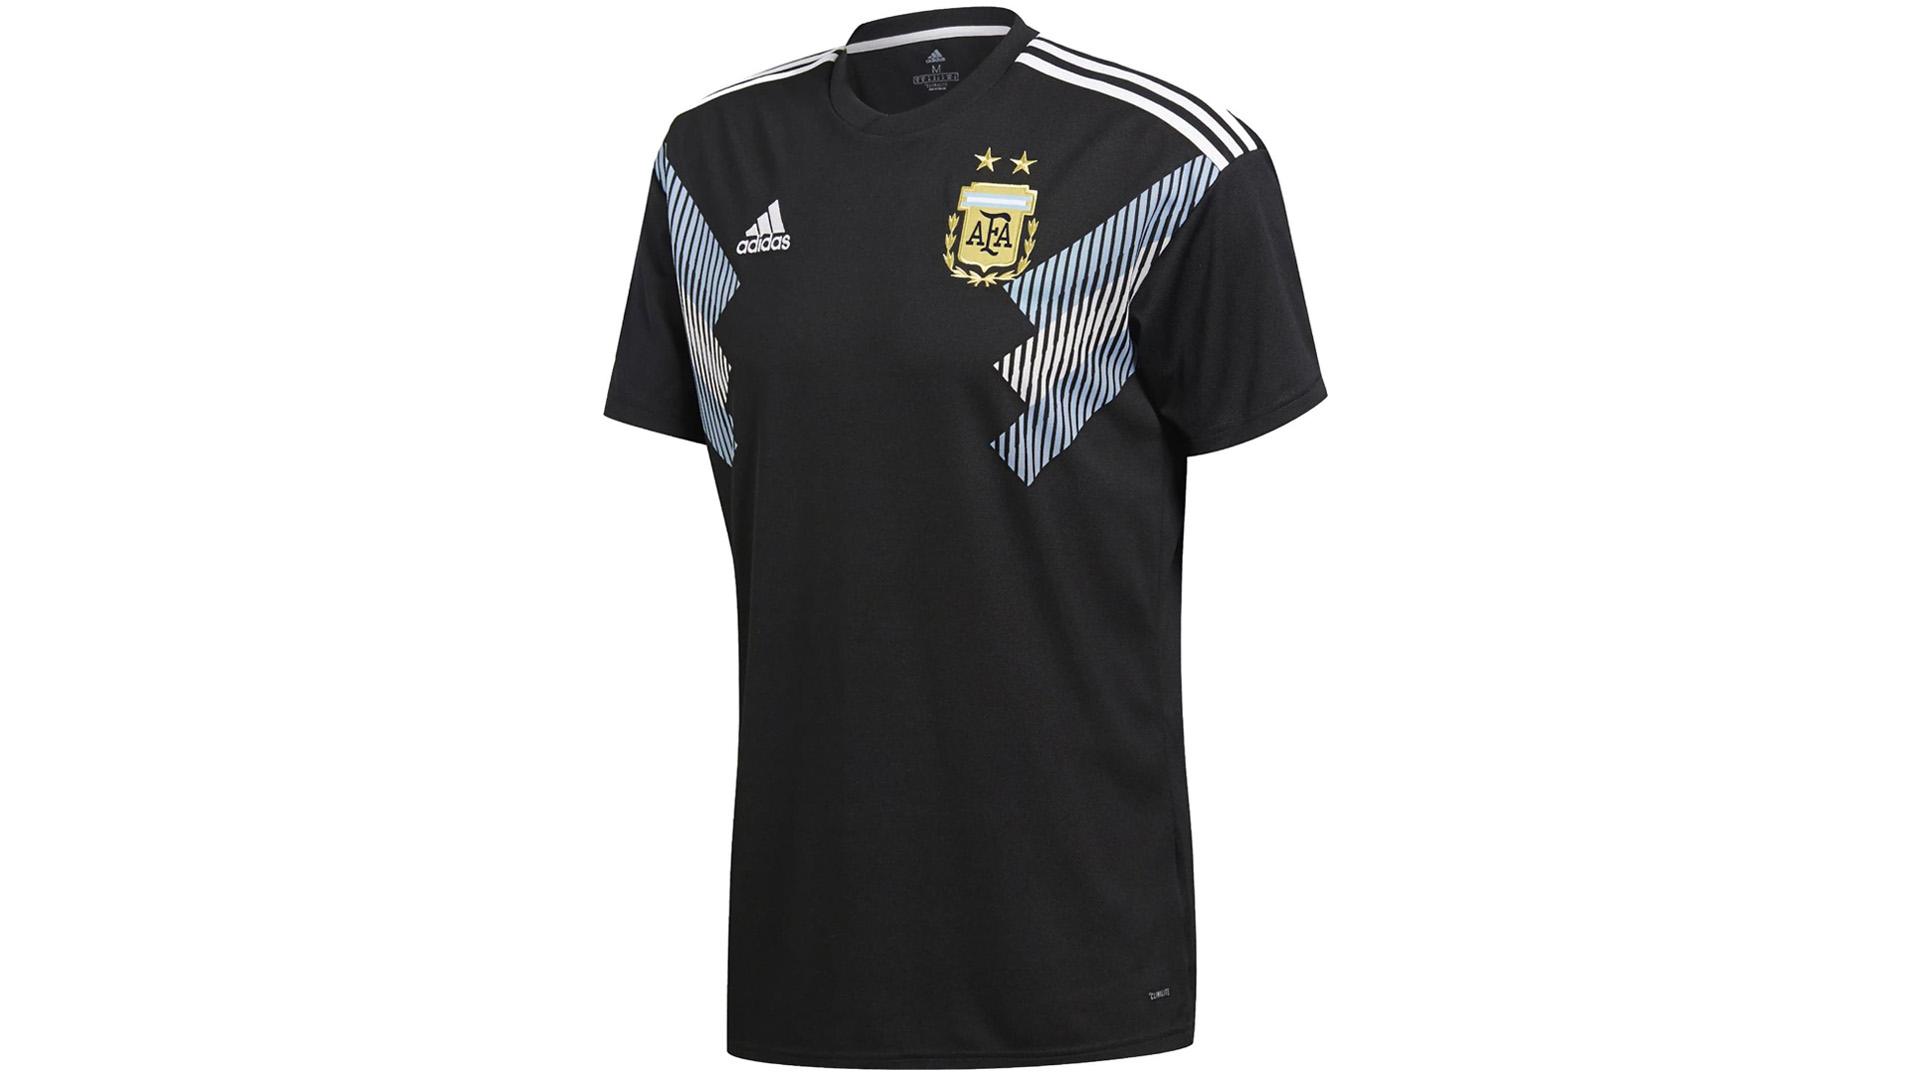 camiseta alternativa de la seleccion argentina 2016